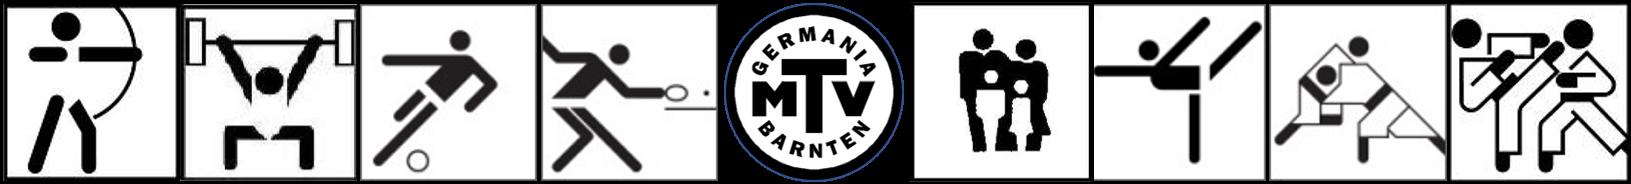 MTV Germania Barnten von 1906 e.V.